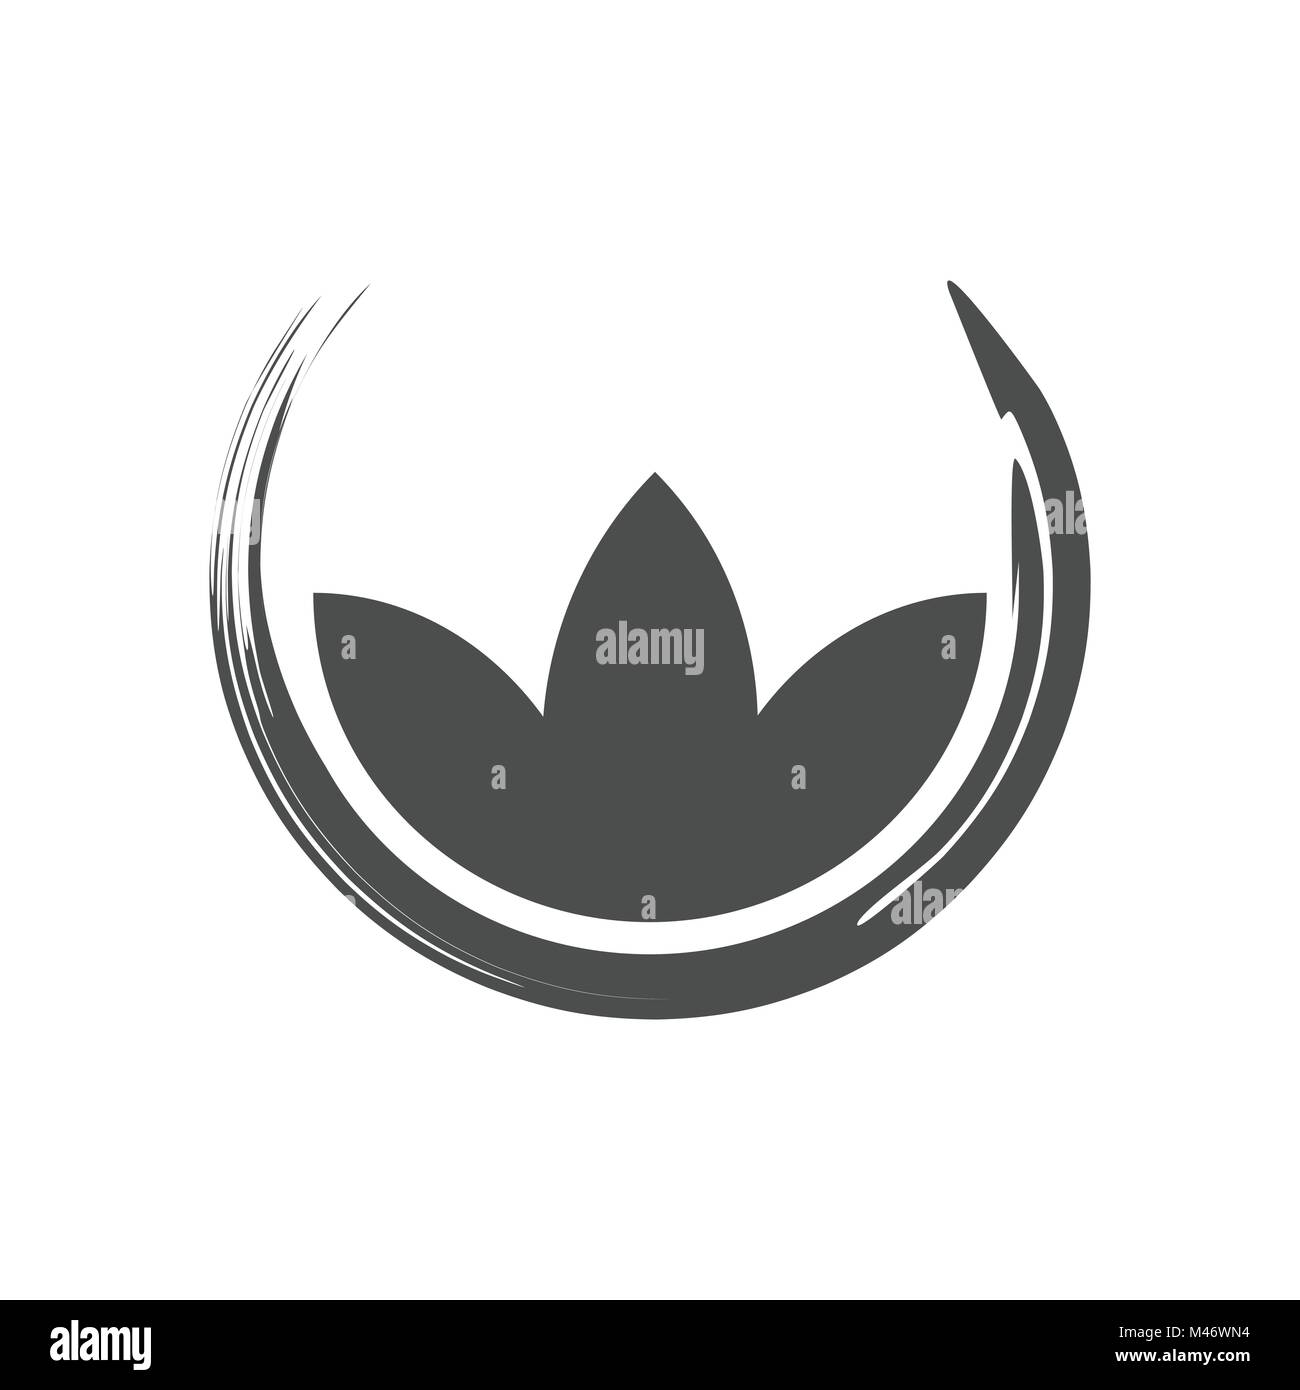 Lotus flower icon simple style stock photos lotus flower icon lotus zen symbol abstract brush vector graphic design stock image izmirmasajfo